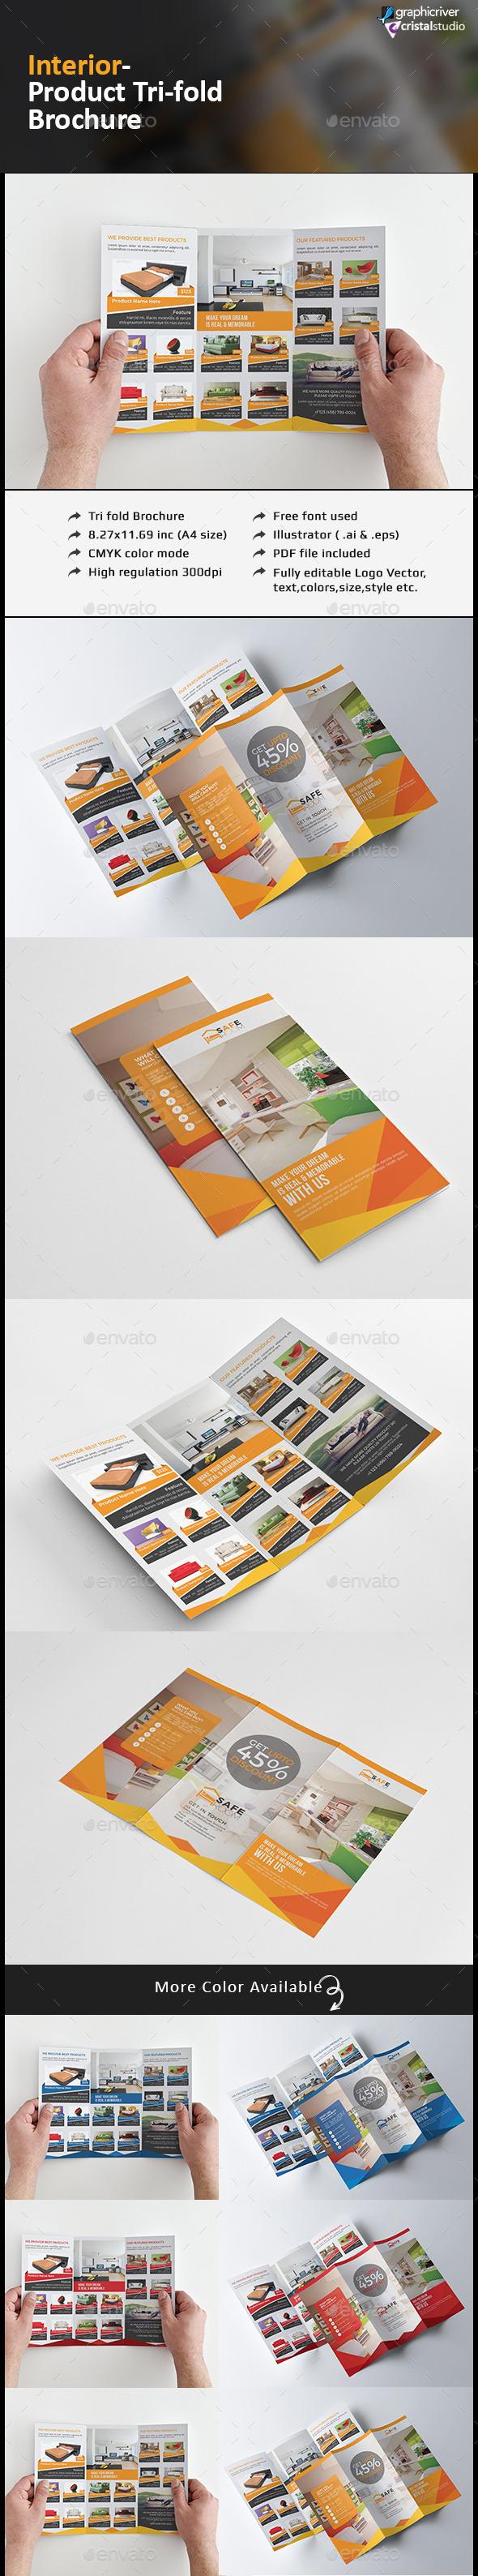 Interior Product Tri fold Brochure